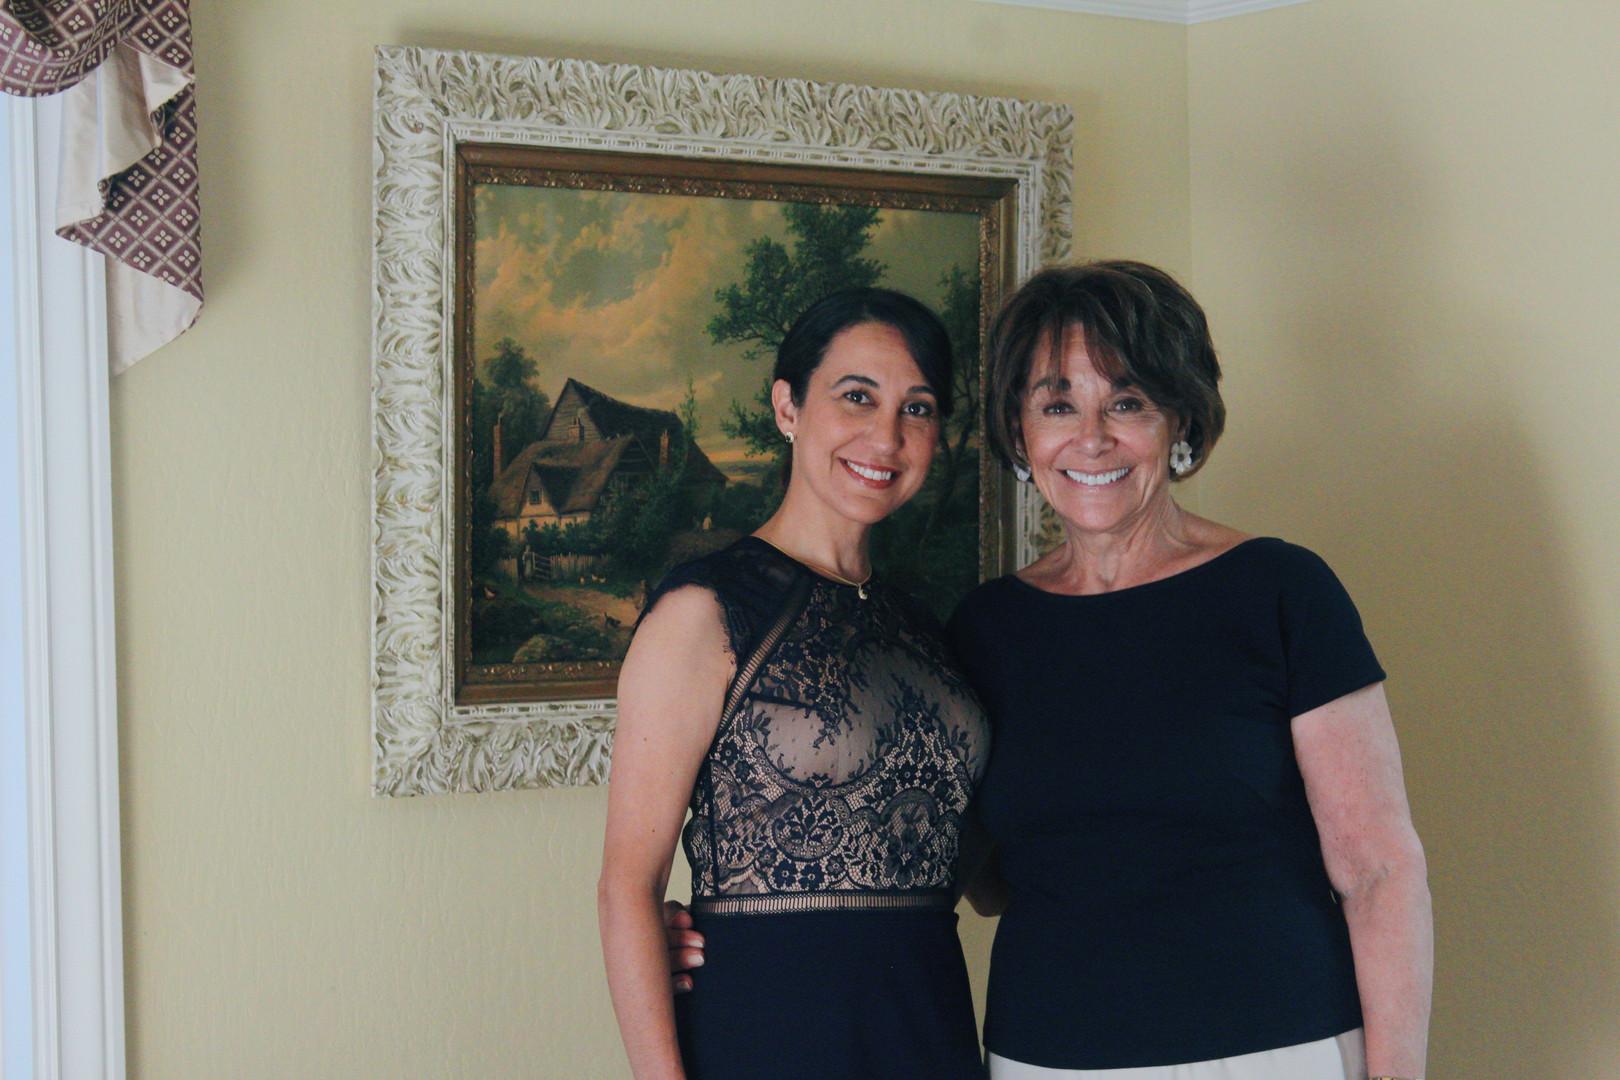 Renee with Congresswoman Anna Eshoo